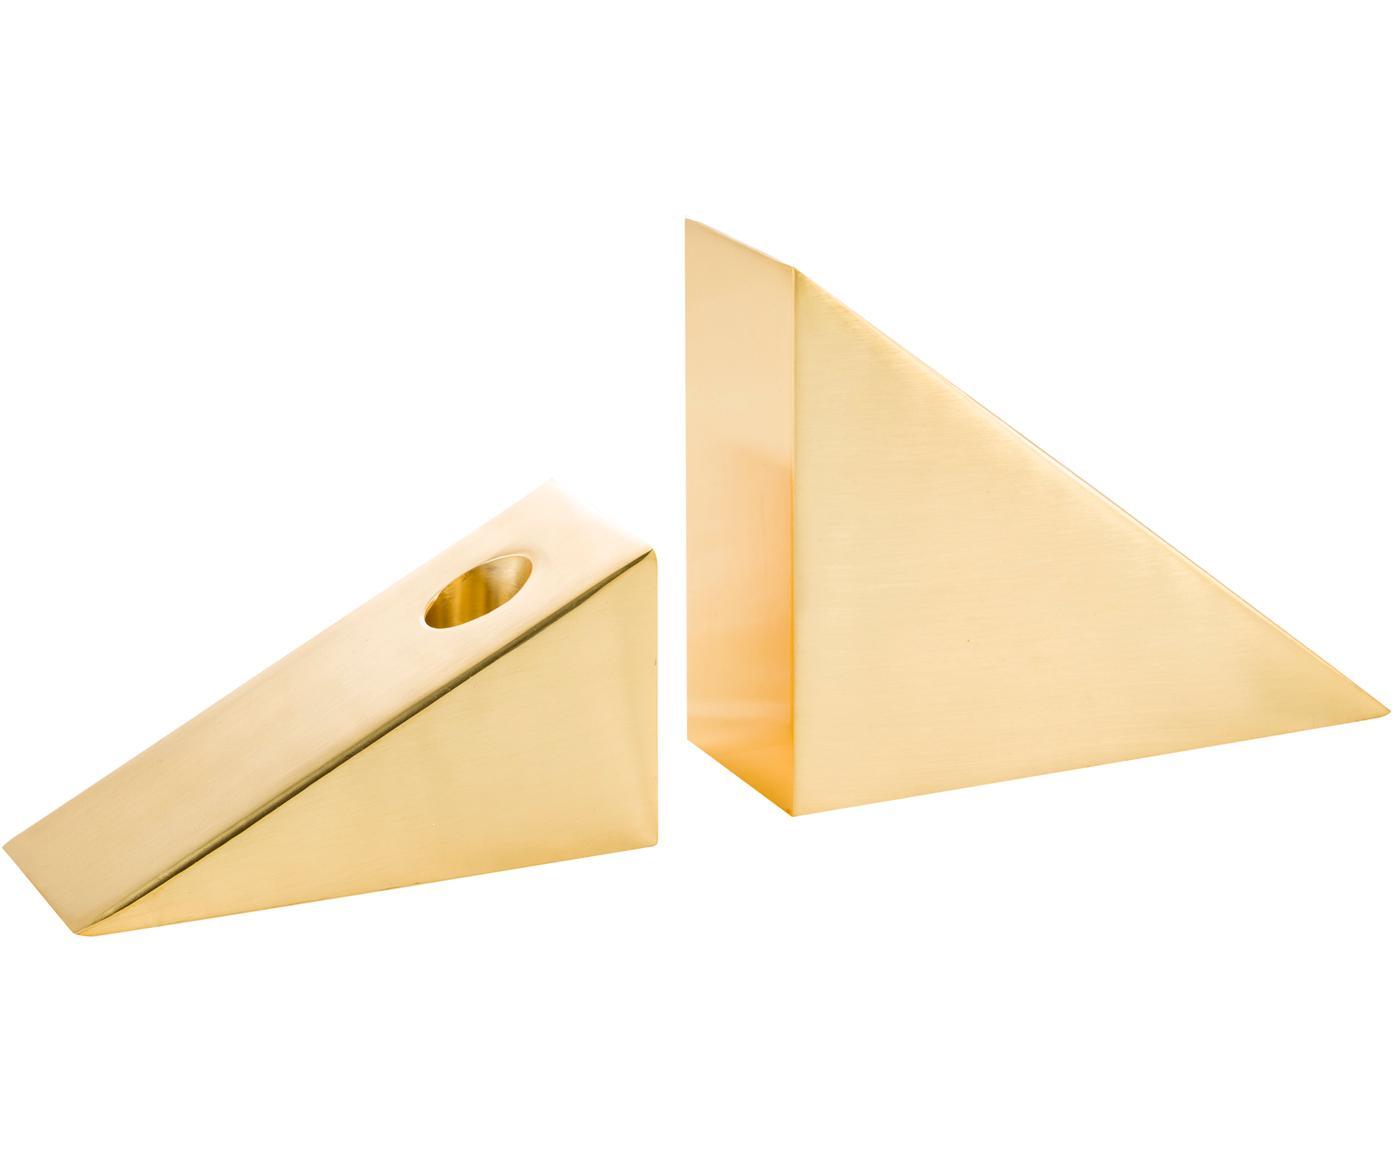 Set de candelabros Edge, 2pzas., Acero inoxidable, Dorado, An 15 x Al 11 cm